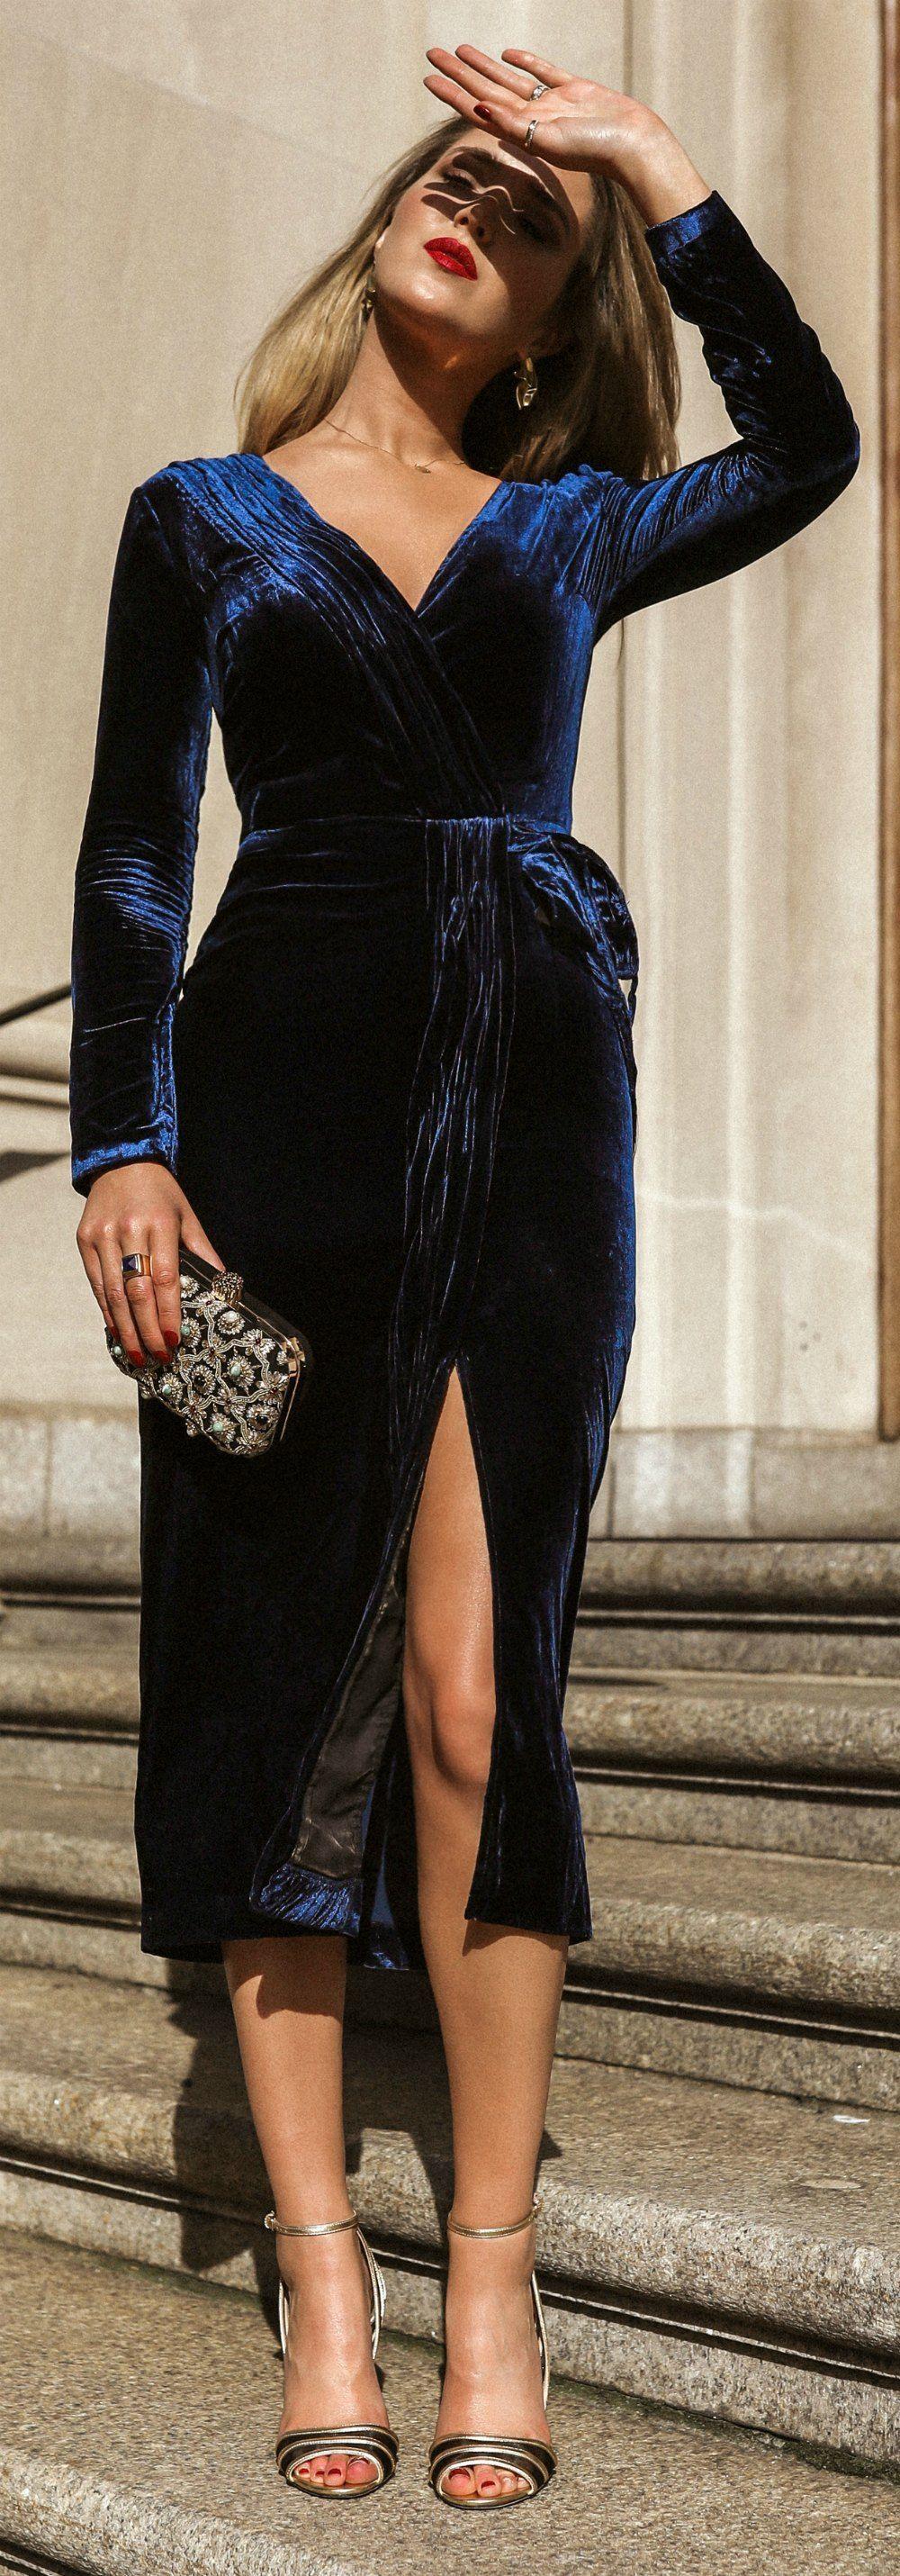 Click For Outfit Details Blue Velvet V Neck Wrap Dress With Self Belt At Waist Black Gol Cocktail Attire Cocktail Attire For Women Winter Wedding Attire [ 2861 x 1000 Pixel ]